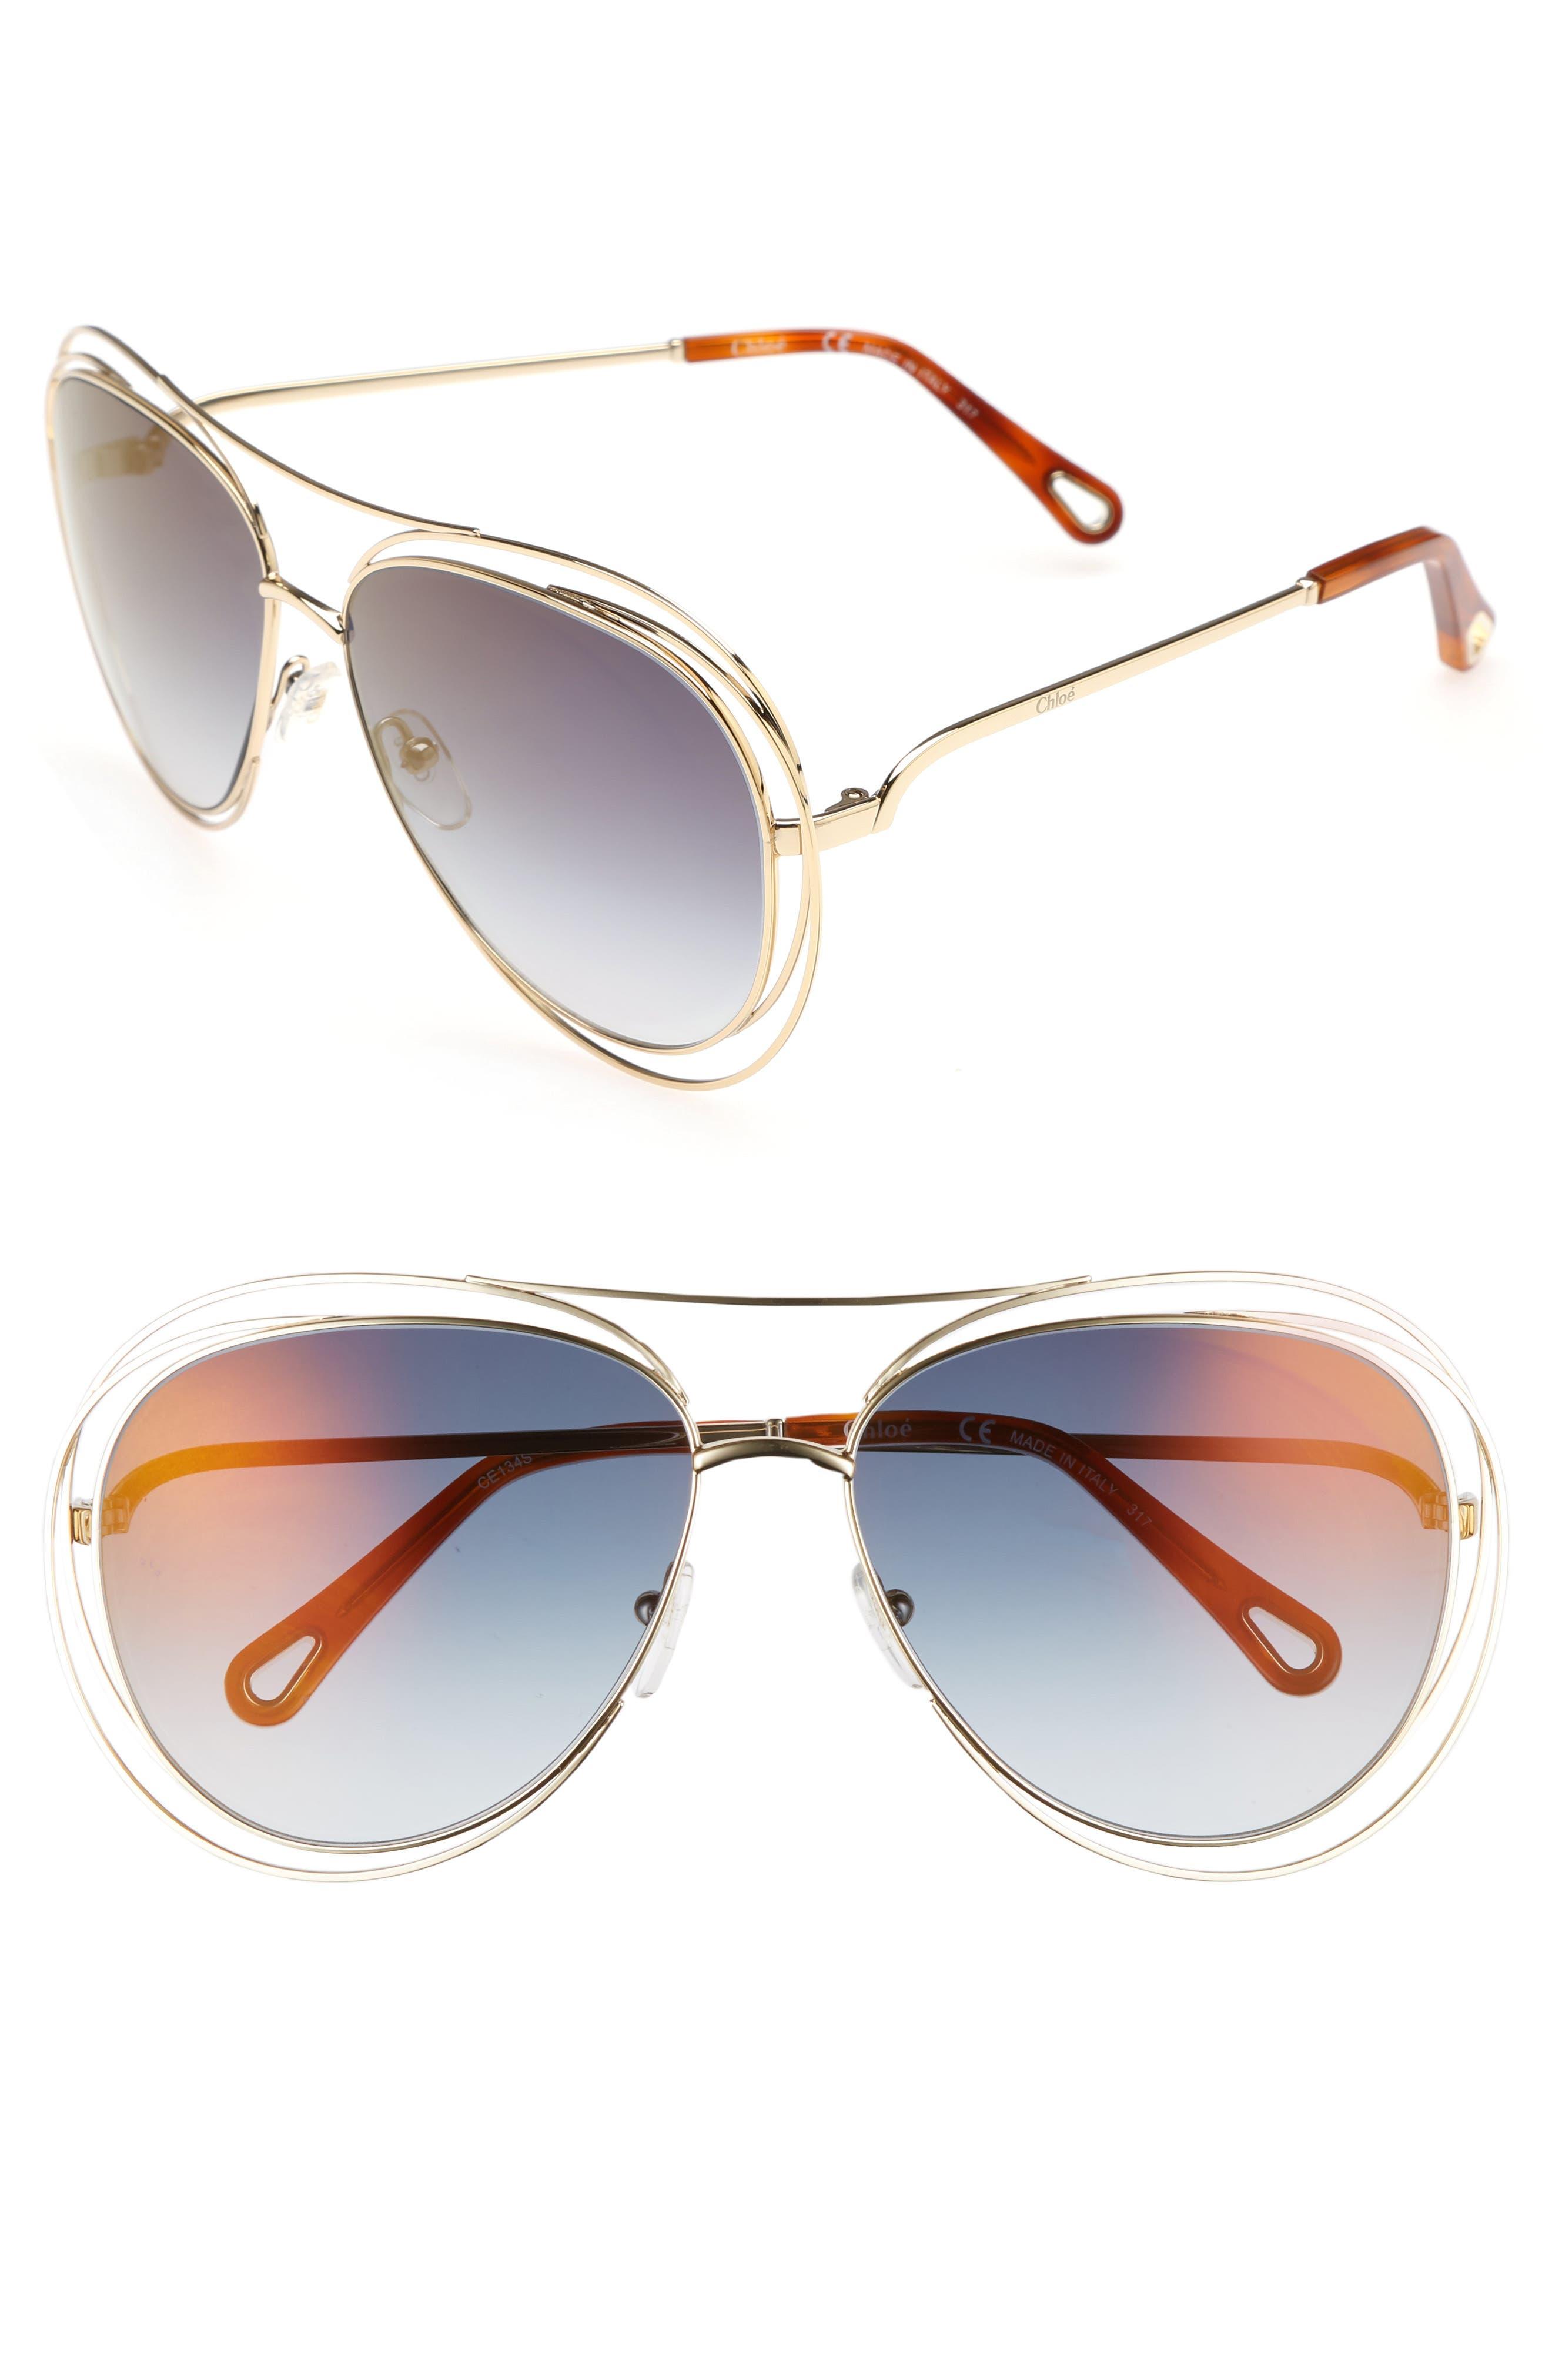 CHLOÉ, 61mm Aviator Sunglasses, Main thumbnail 1, color, GOLD/ HAVANA/ FLASH BLUE